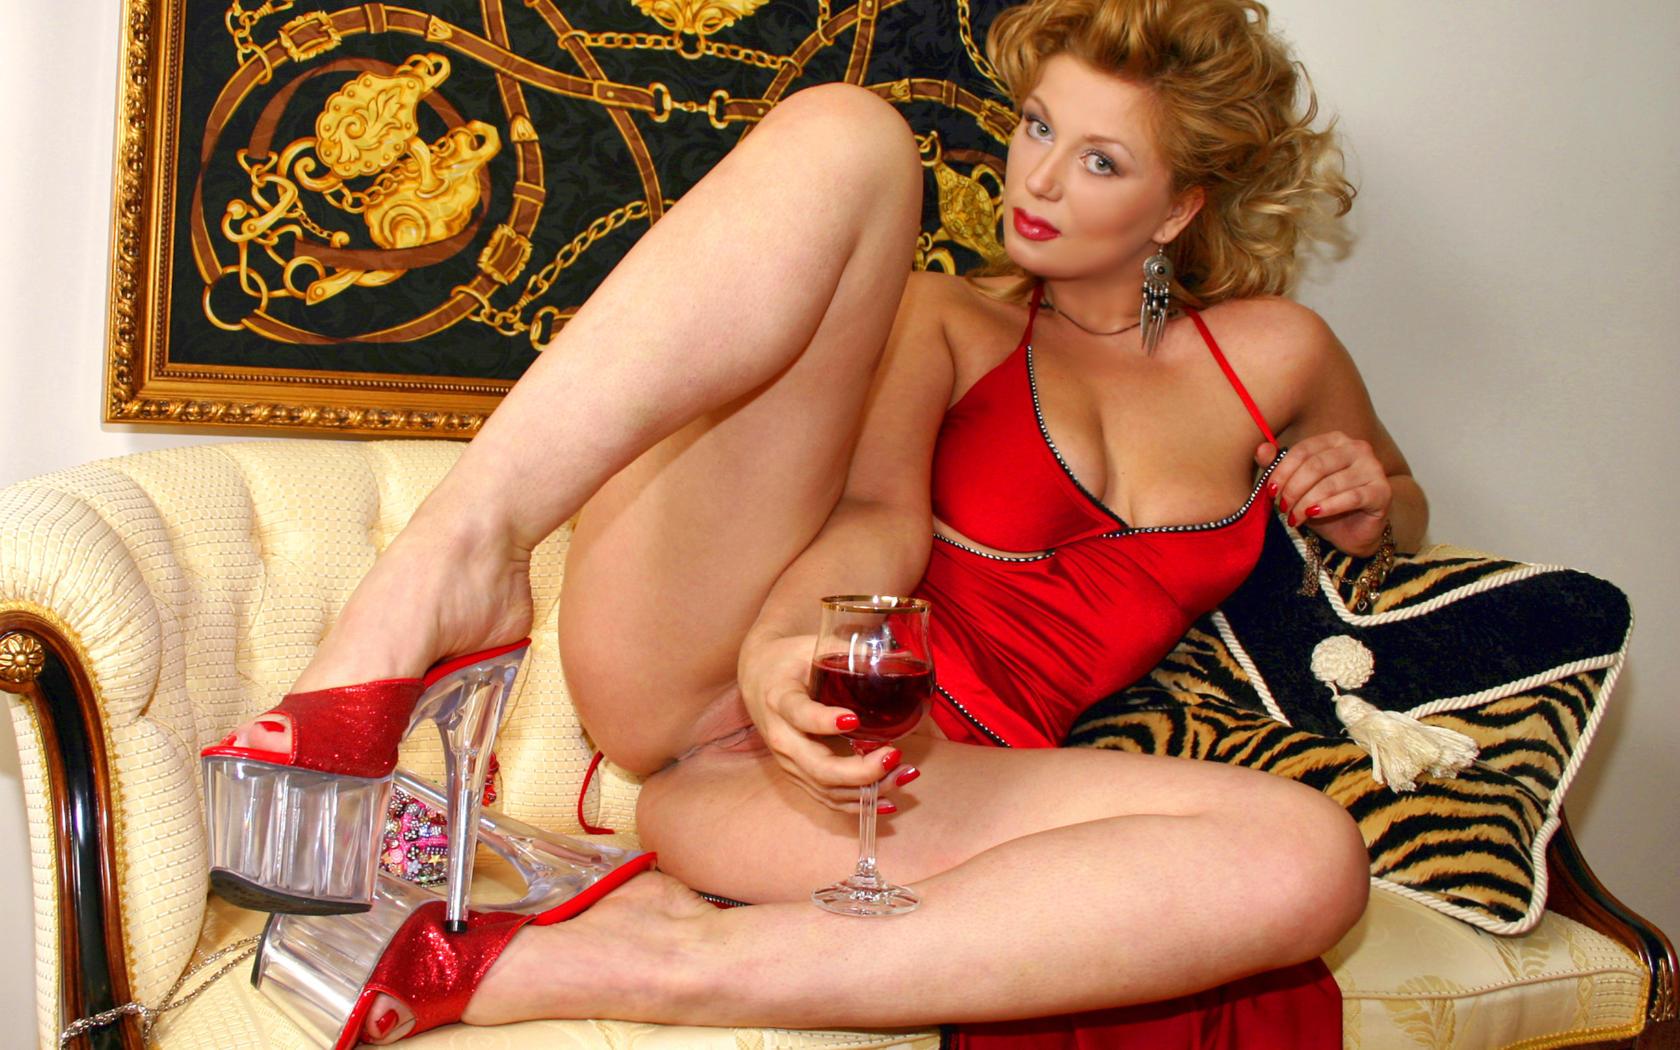 Hot pussy escorts erotic pics